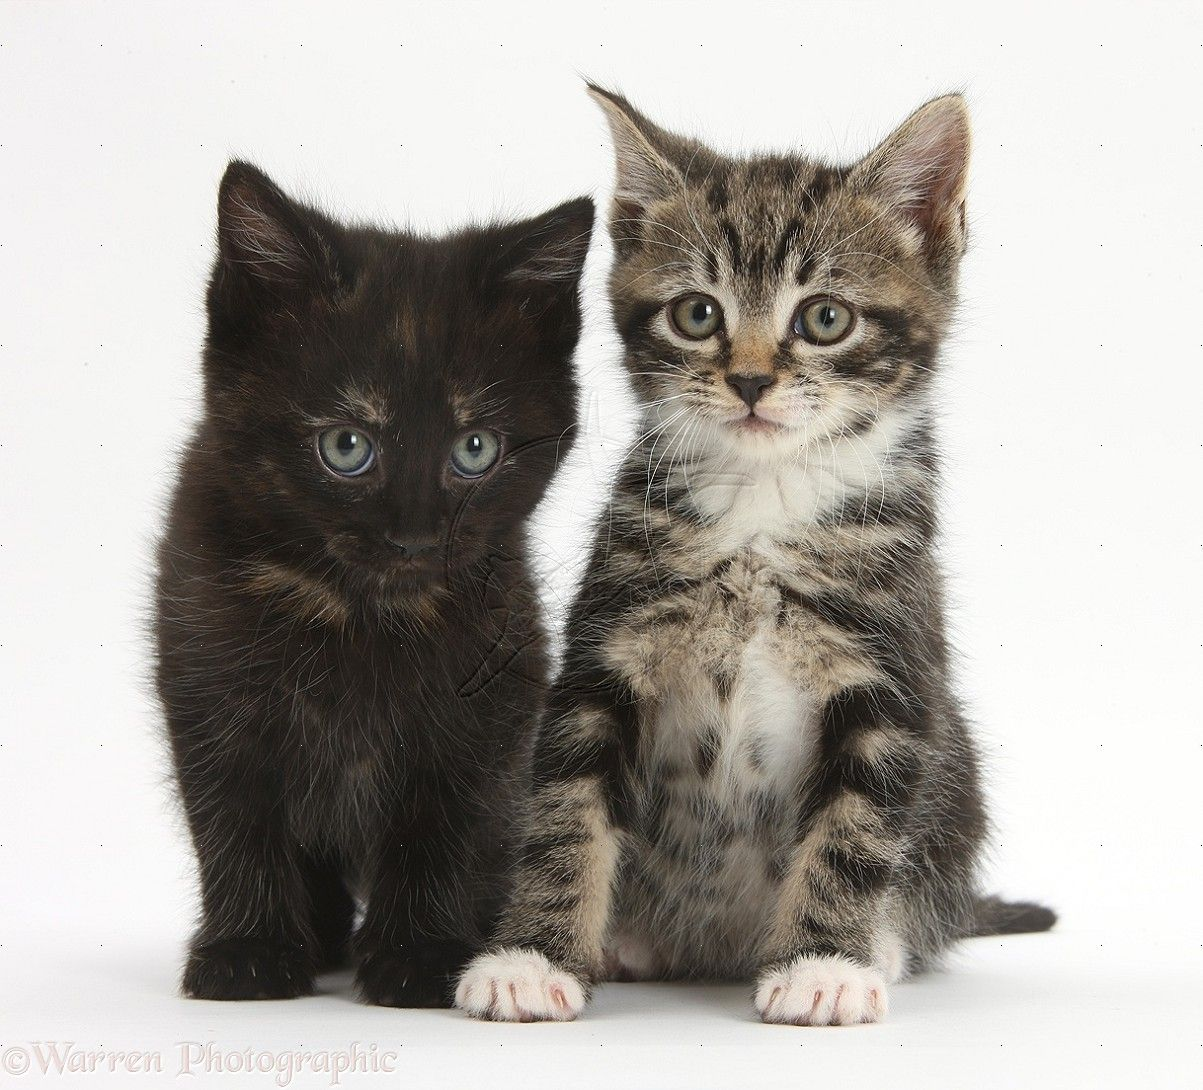 Tabby And Black Kittens Photo Kitten Photos Tabby Kitten Kitten Wallpaper